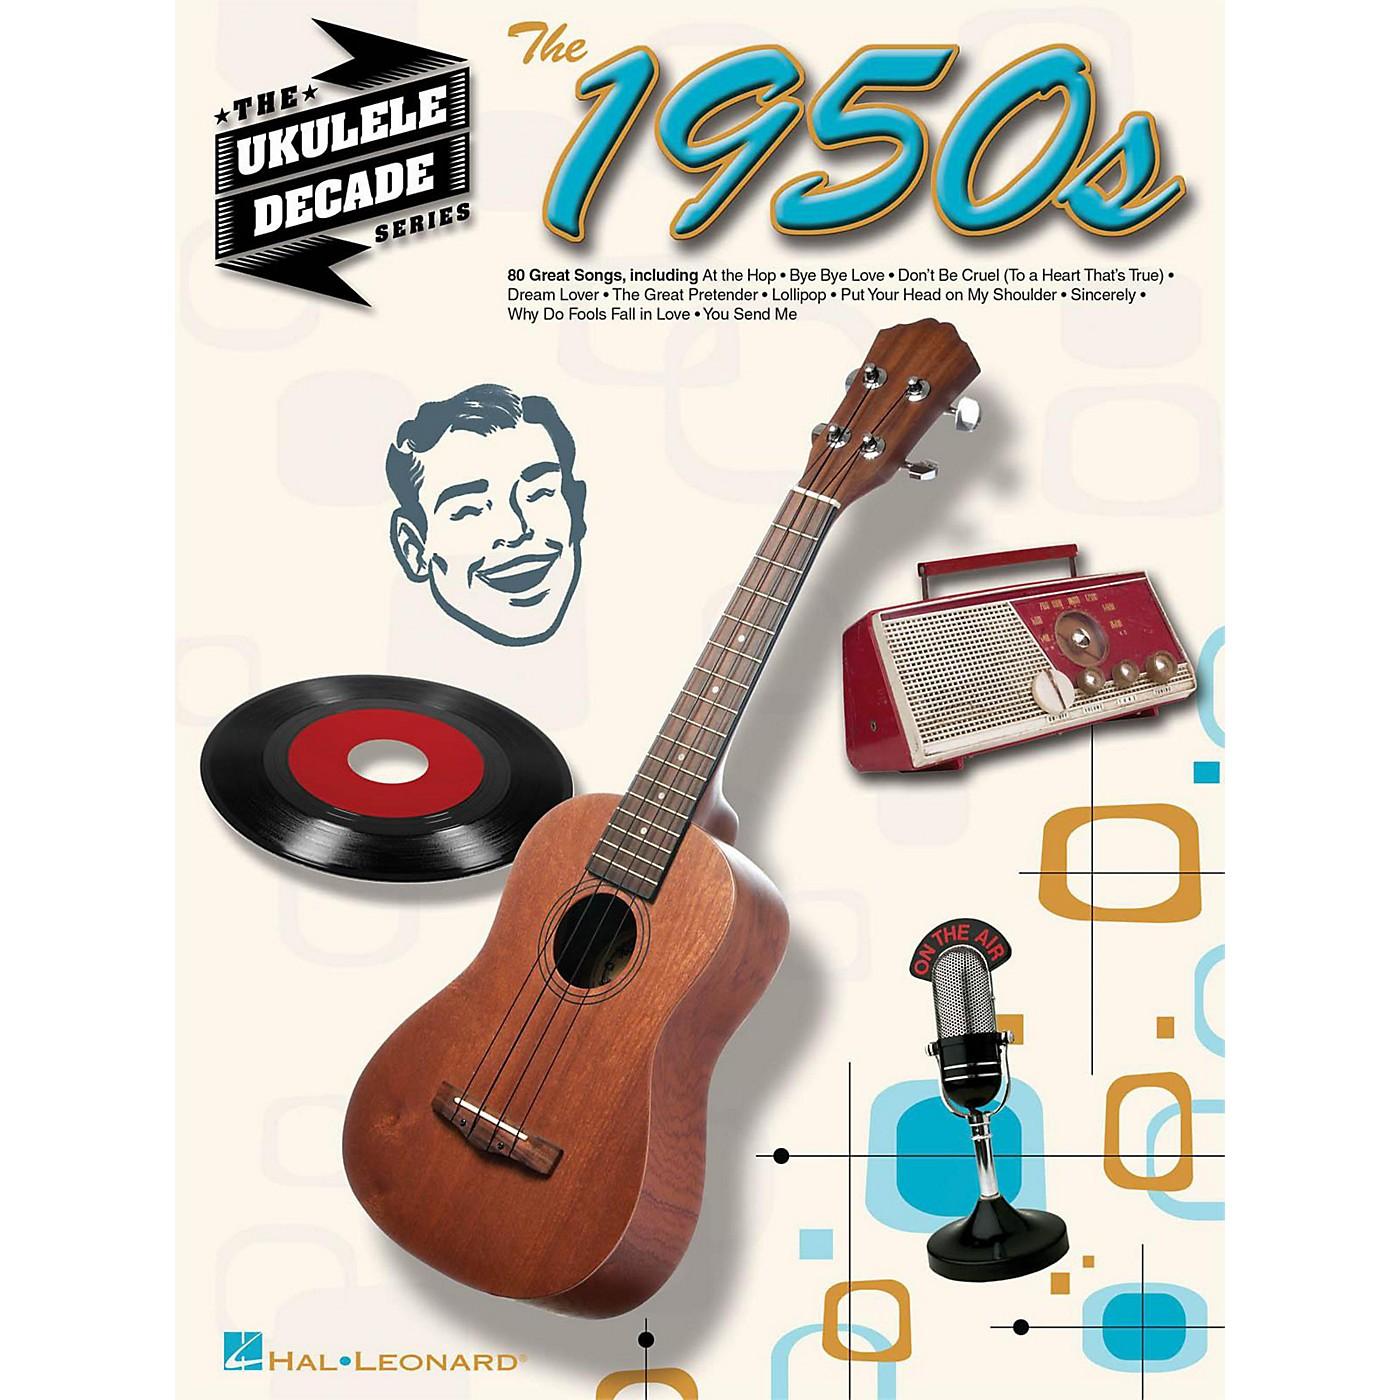 Hal Leonard The 1950s - The Ukulele Decade Series thumbnail